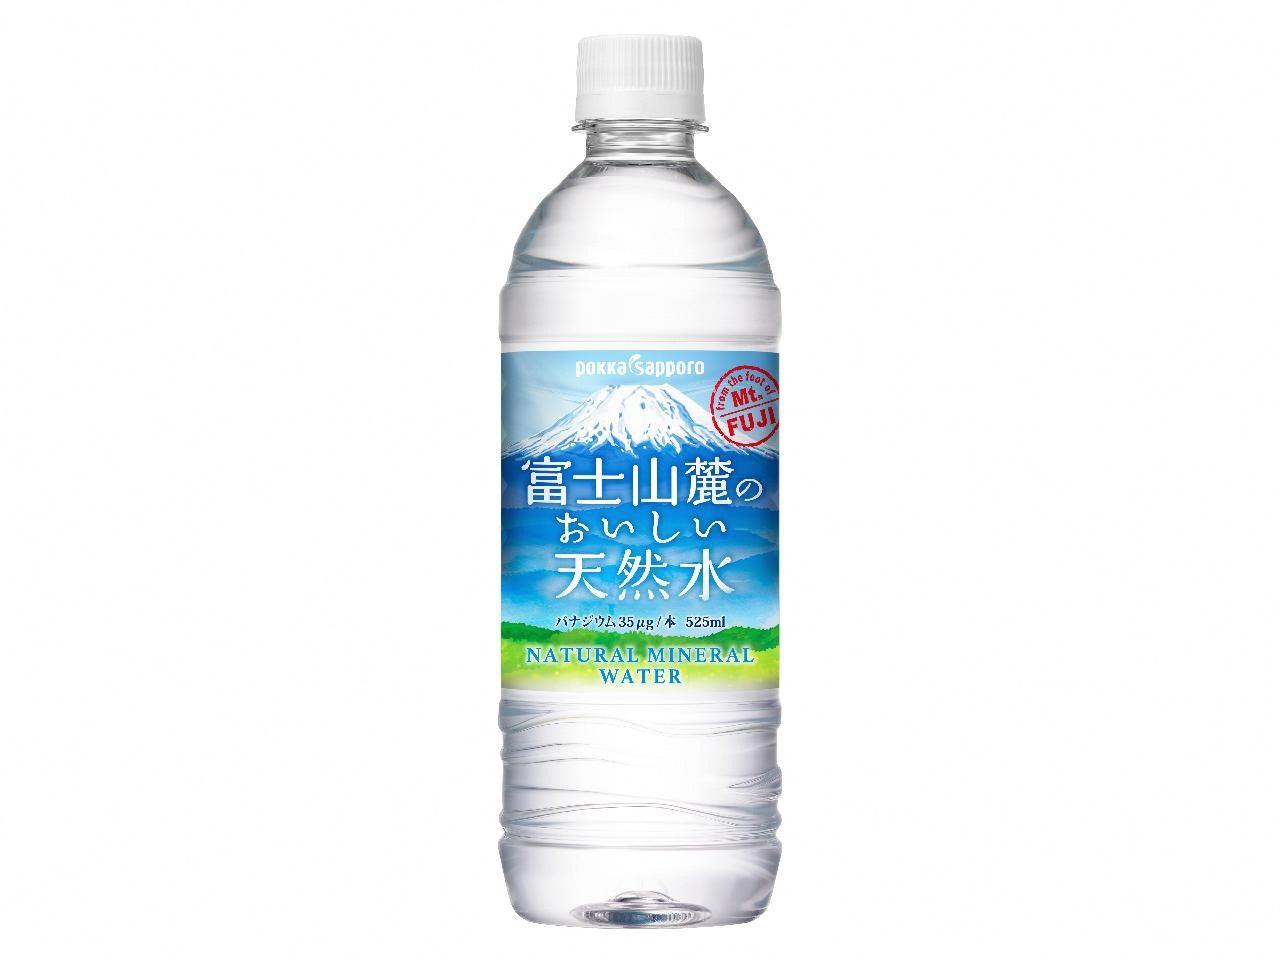 B2富士山麓のおいしい天然水525ml×24本入【北海道・沖縄・離島 配送不可】